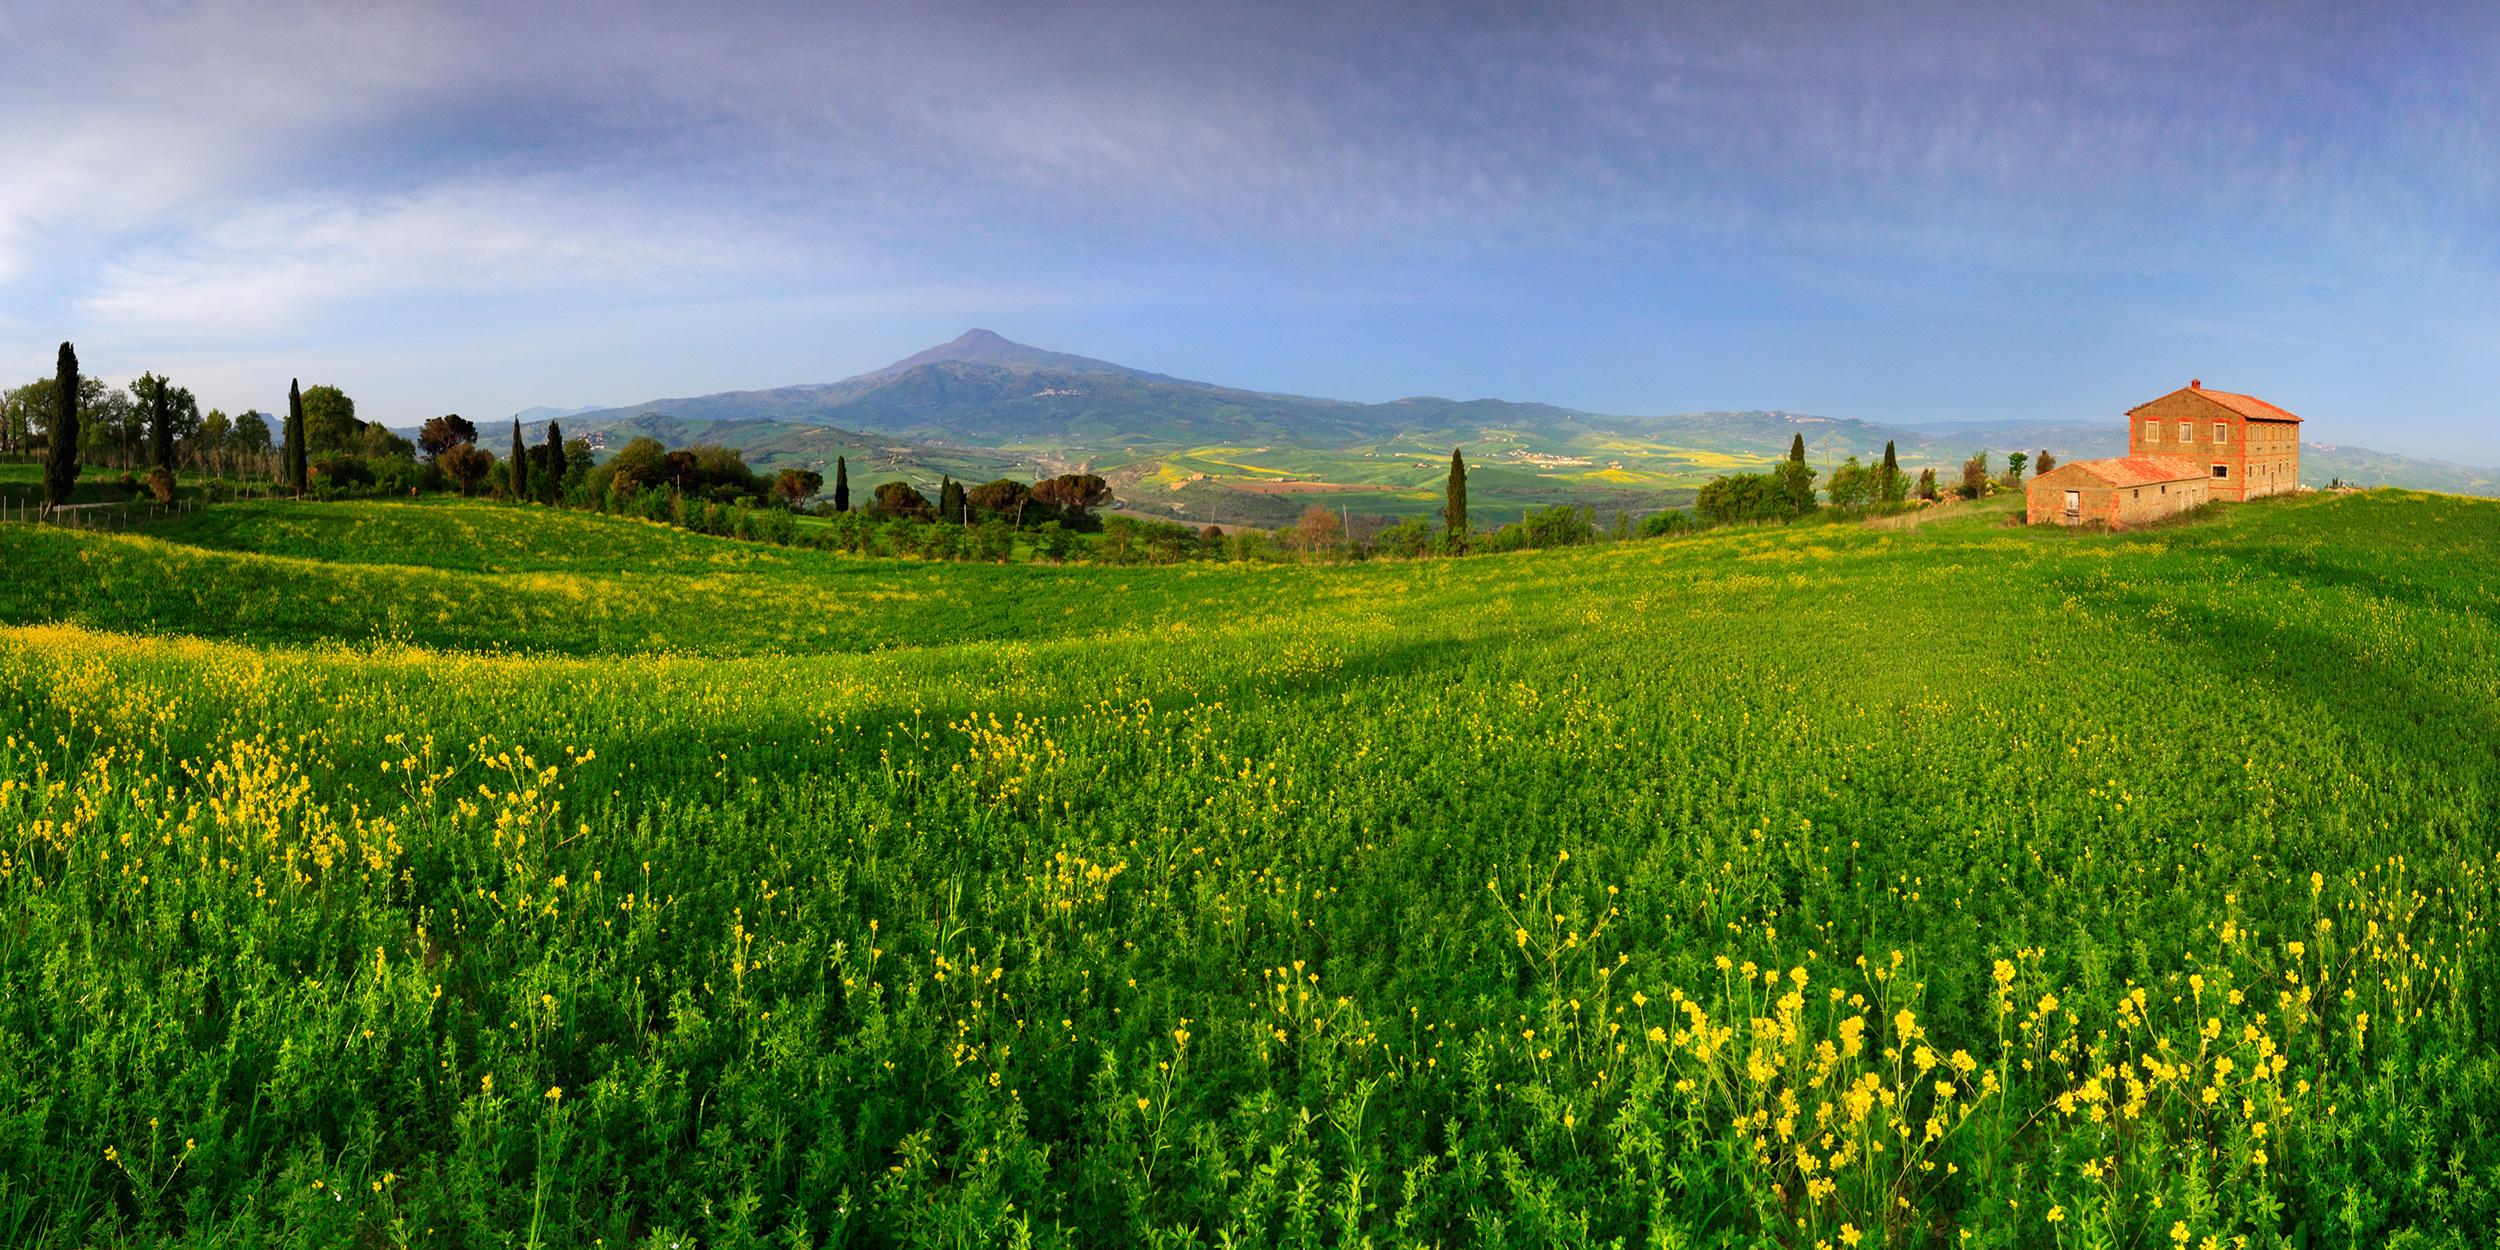 Tuscan wonderland - La Foce, Pienza, Tuscany, Italy